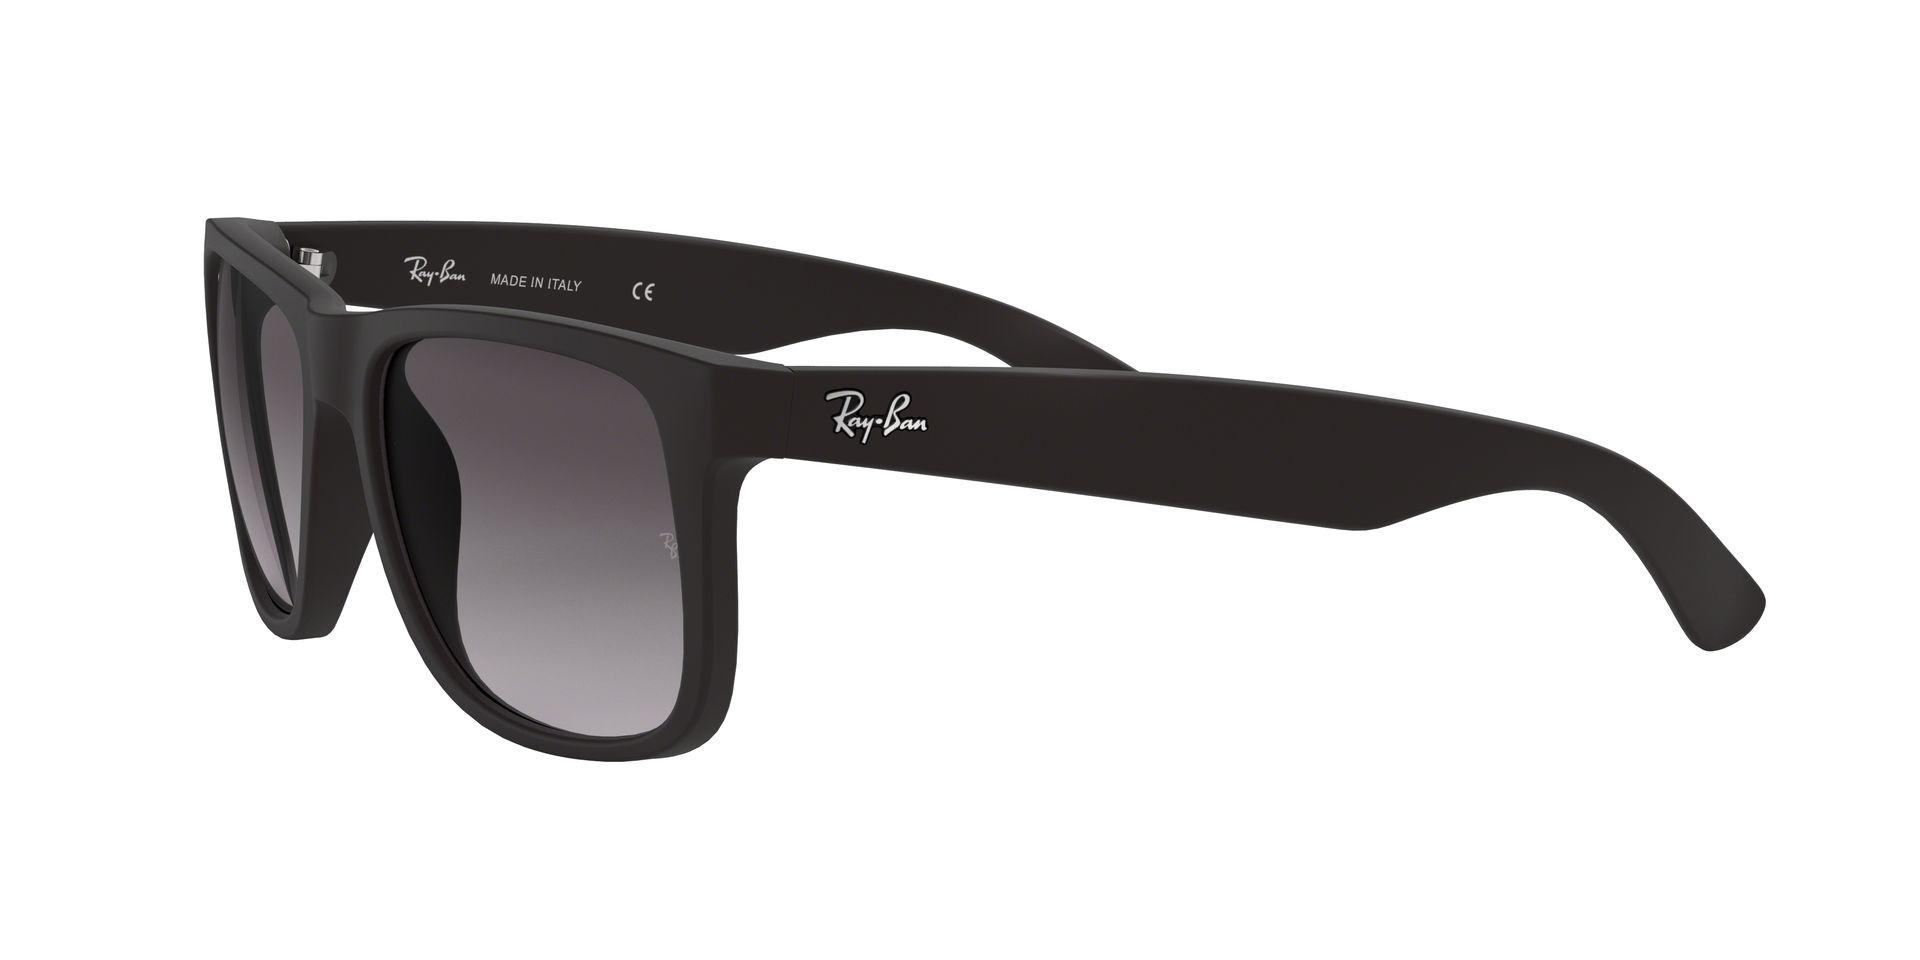 c419fb18611c8 Lentes Ray-Ban Justin rubber black grey gradient - iBikes Store